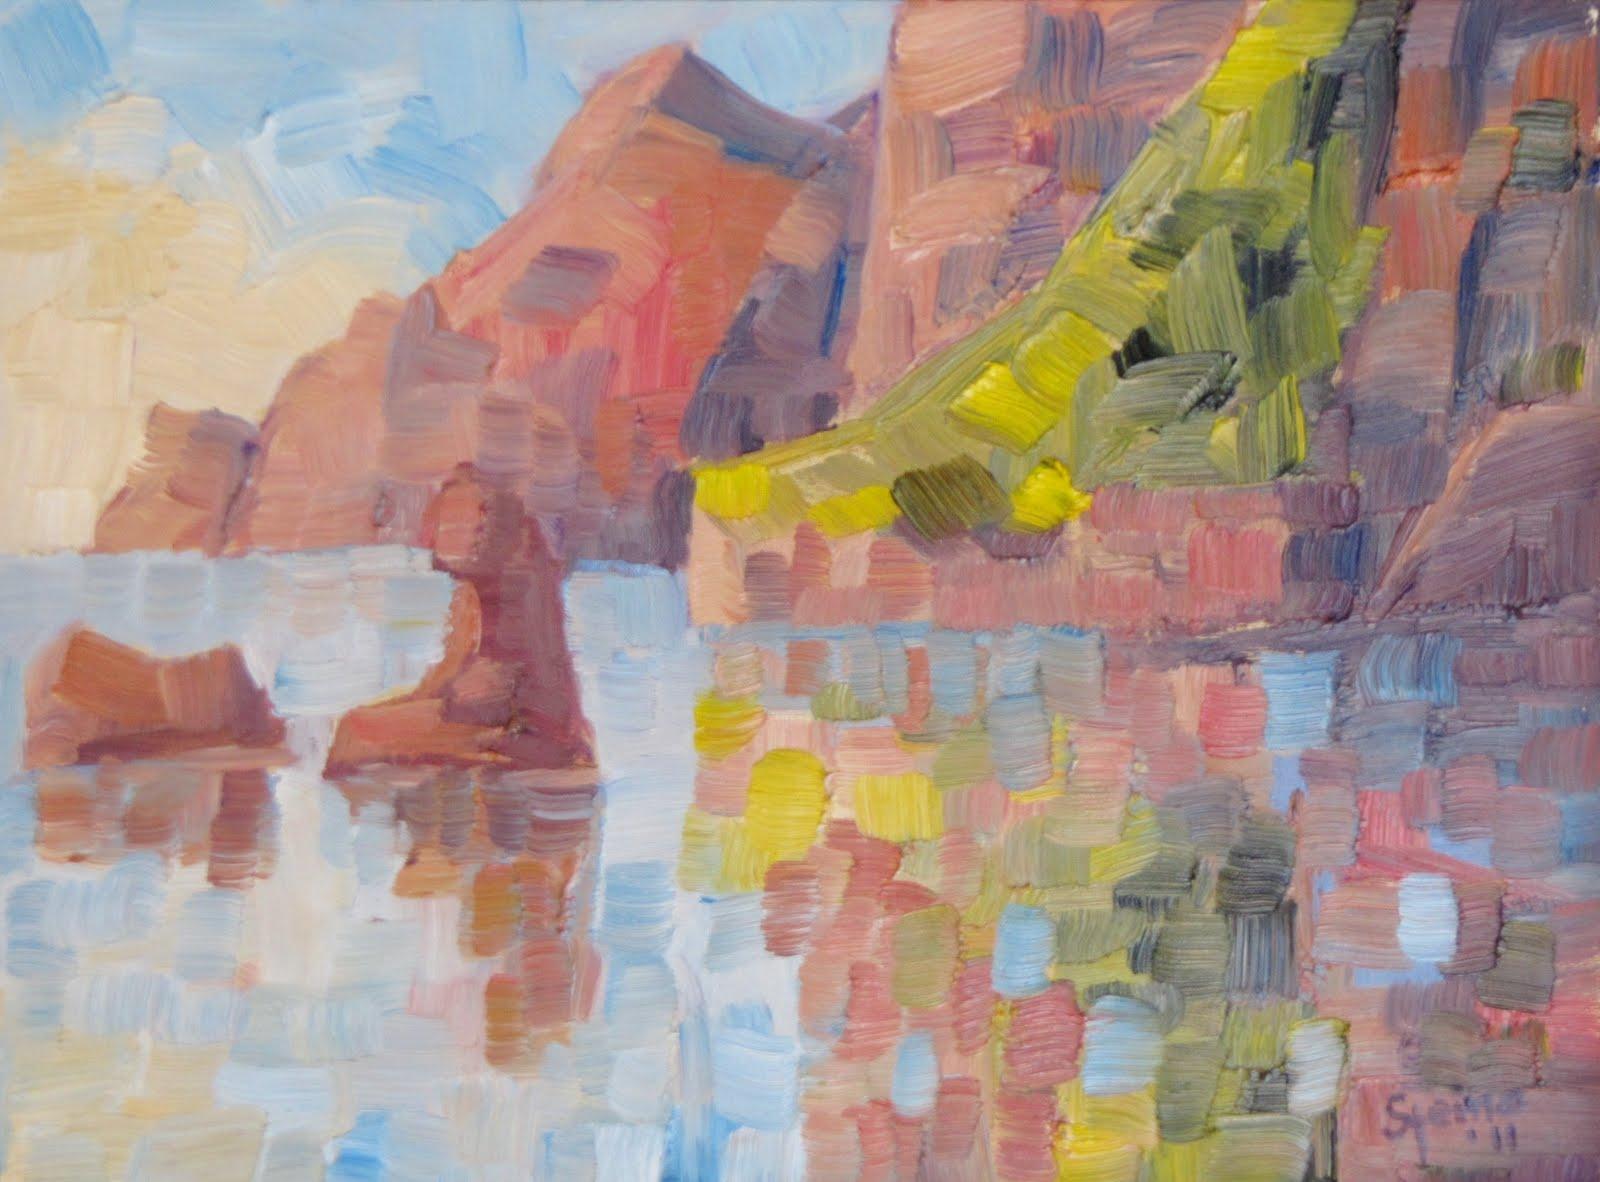 """The Color of Music"" original fine art by Steinunn Einarsdottir"